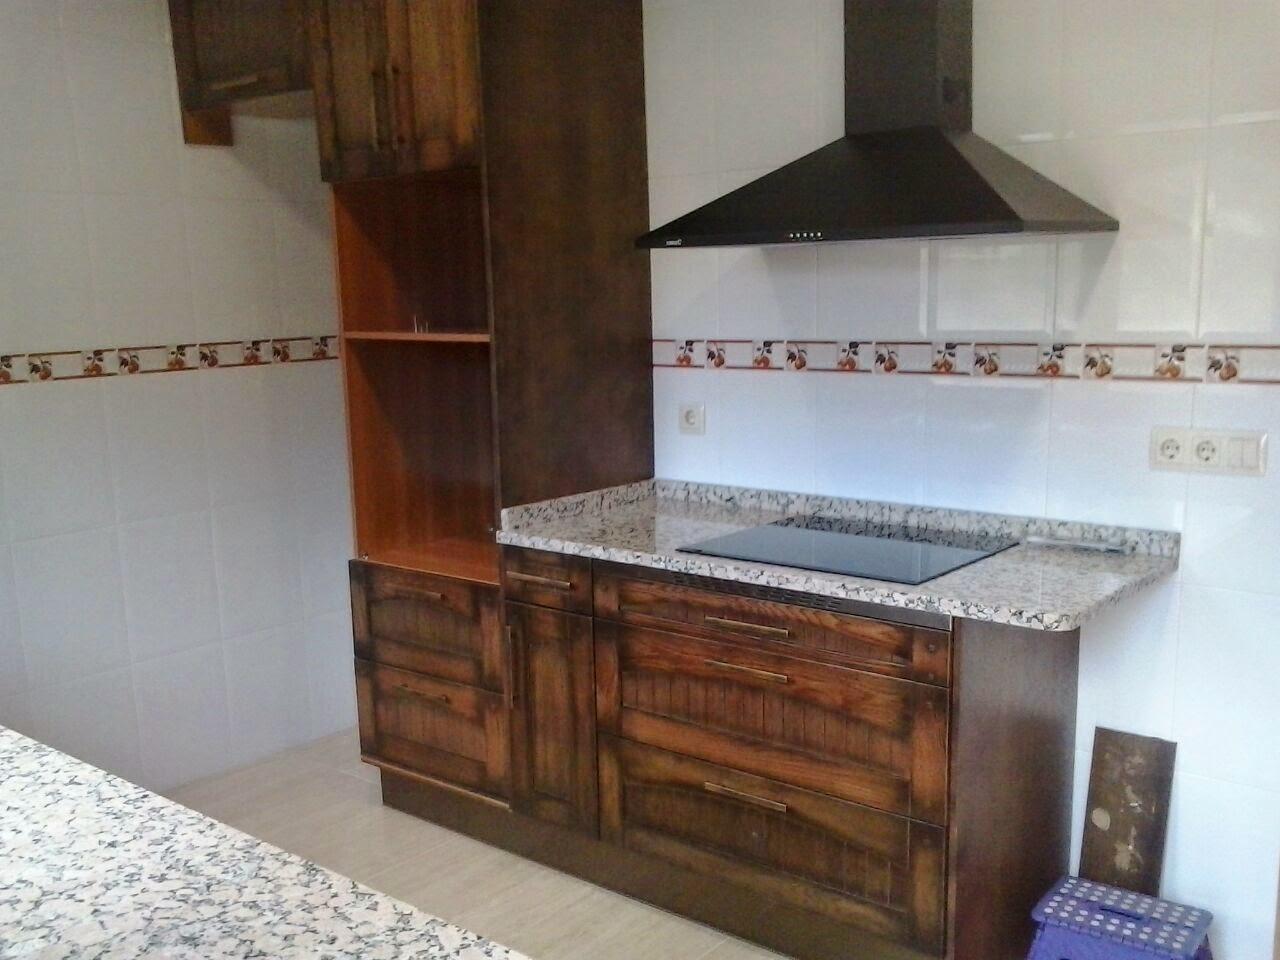 Cocina en madera maciza encimera granito rosavel 3 cms - Encimeras de madera maciza ...